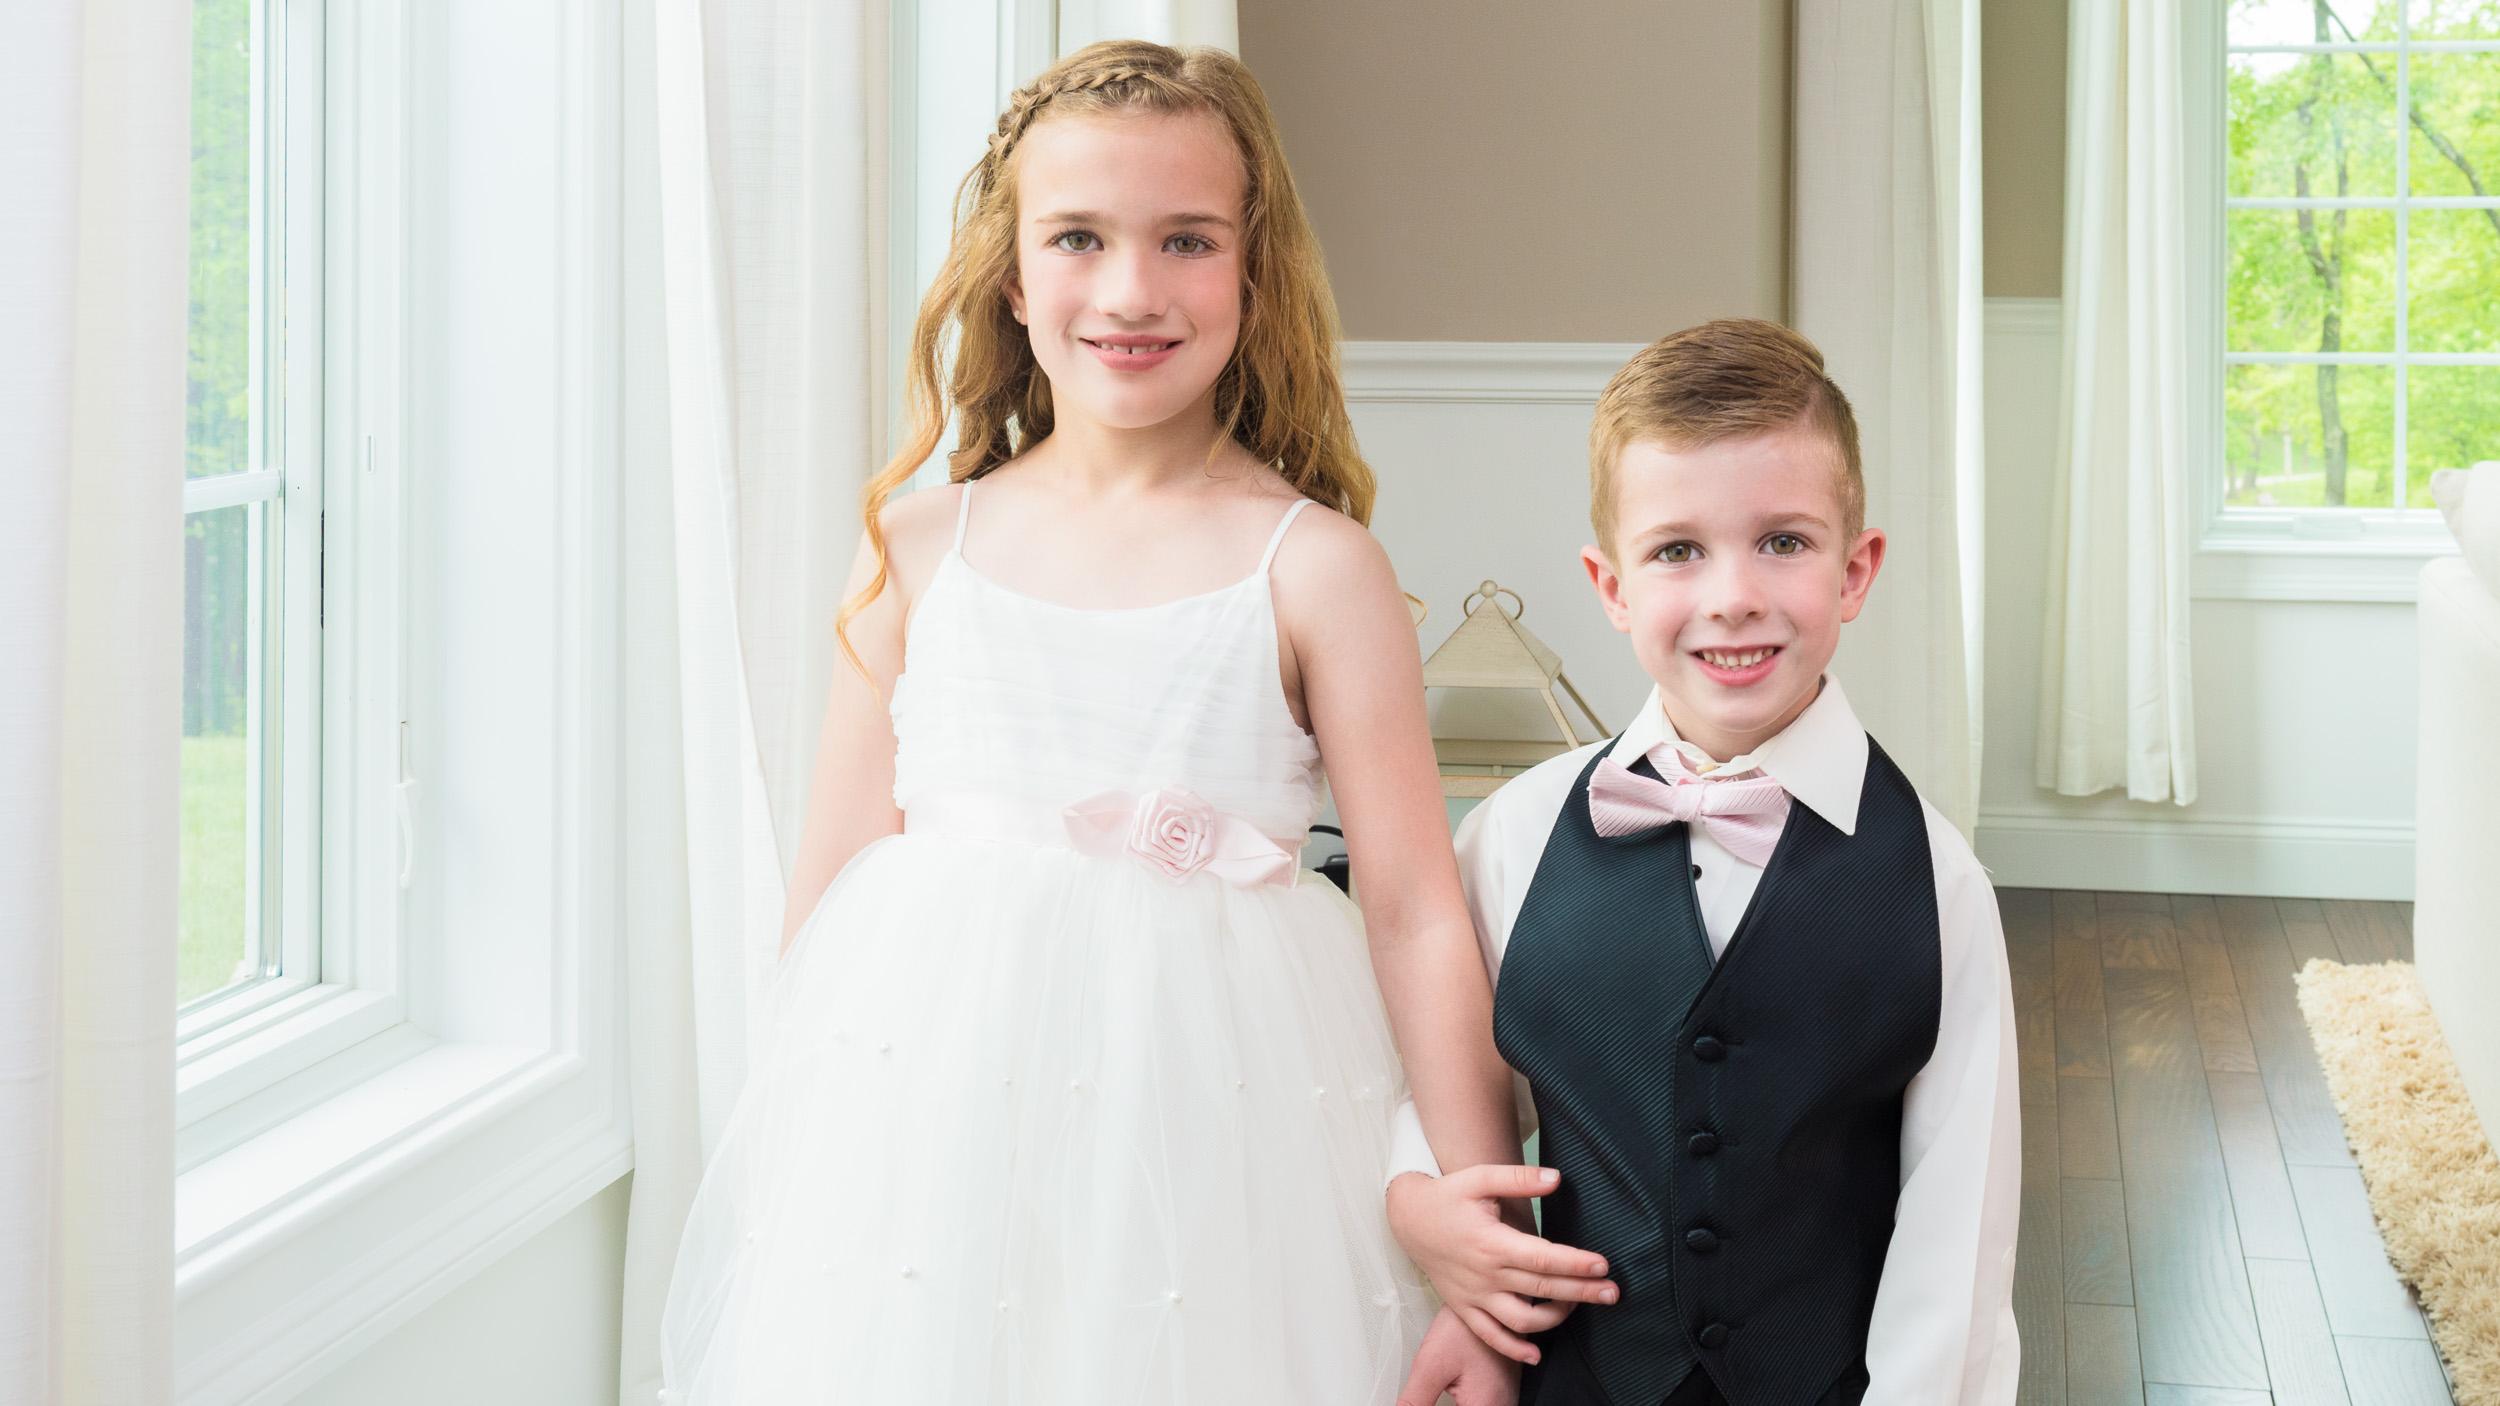 Wedding-little-girl-and-little-boy.jpg